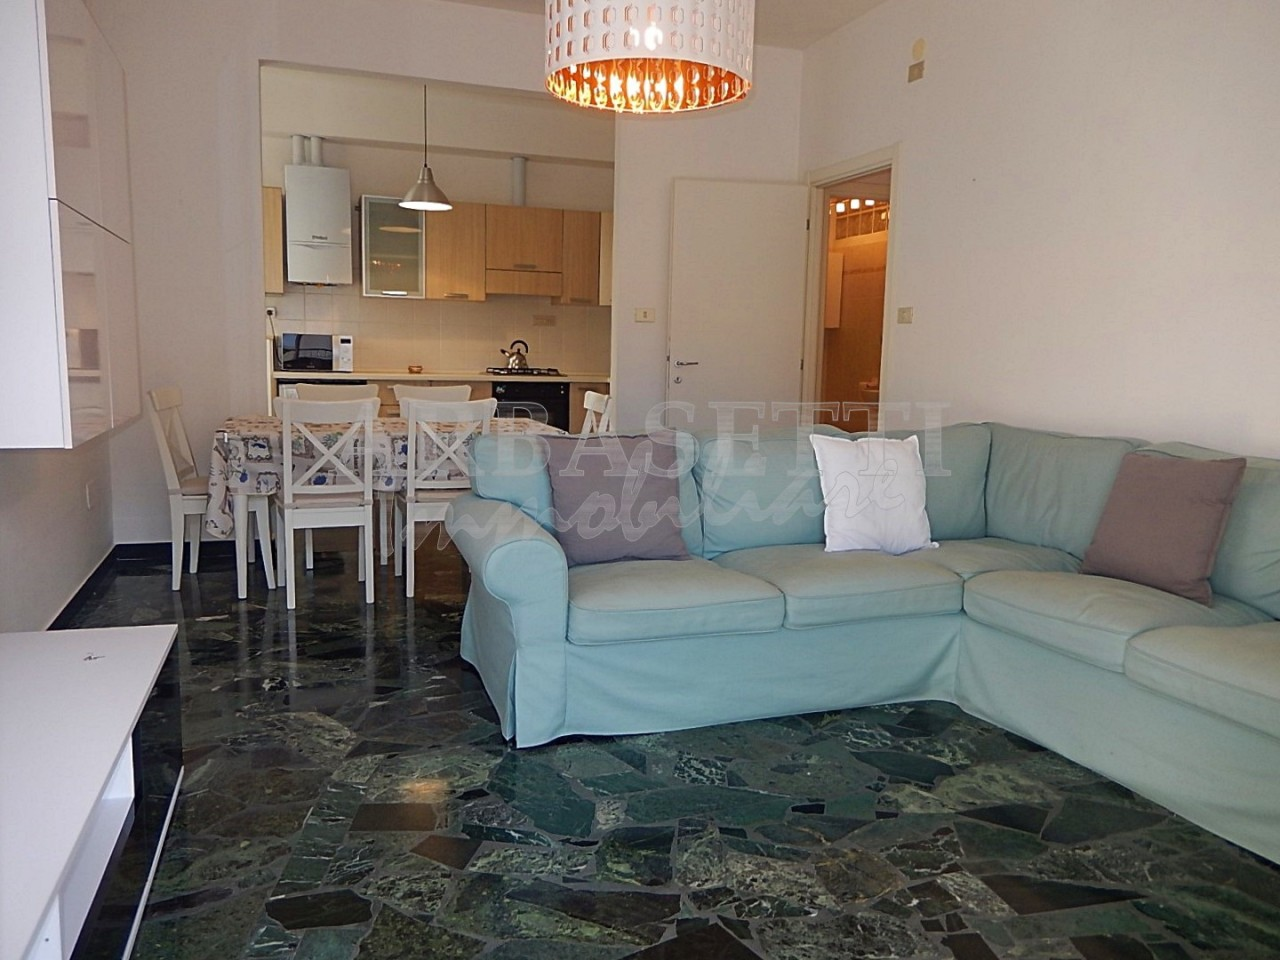 Apartment, 110 Mq, Rent/Transfer - Sestri Levante